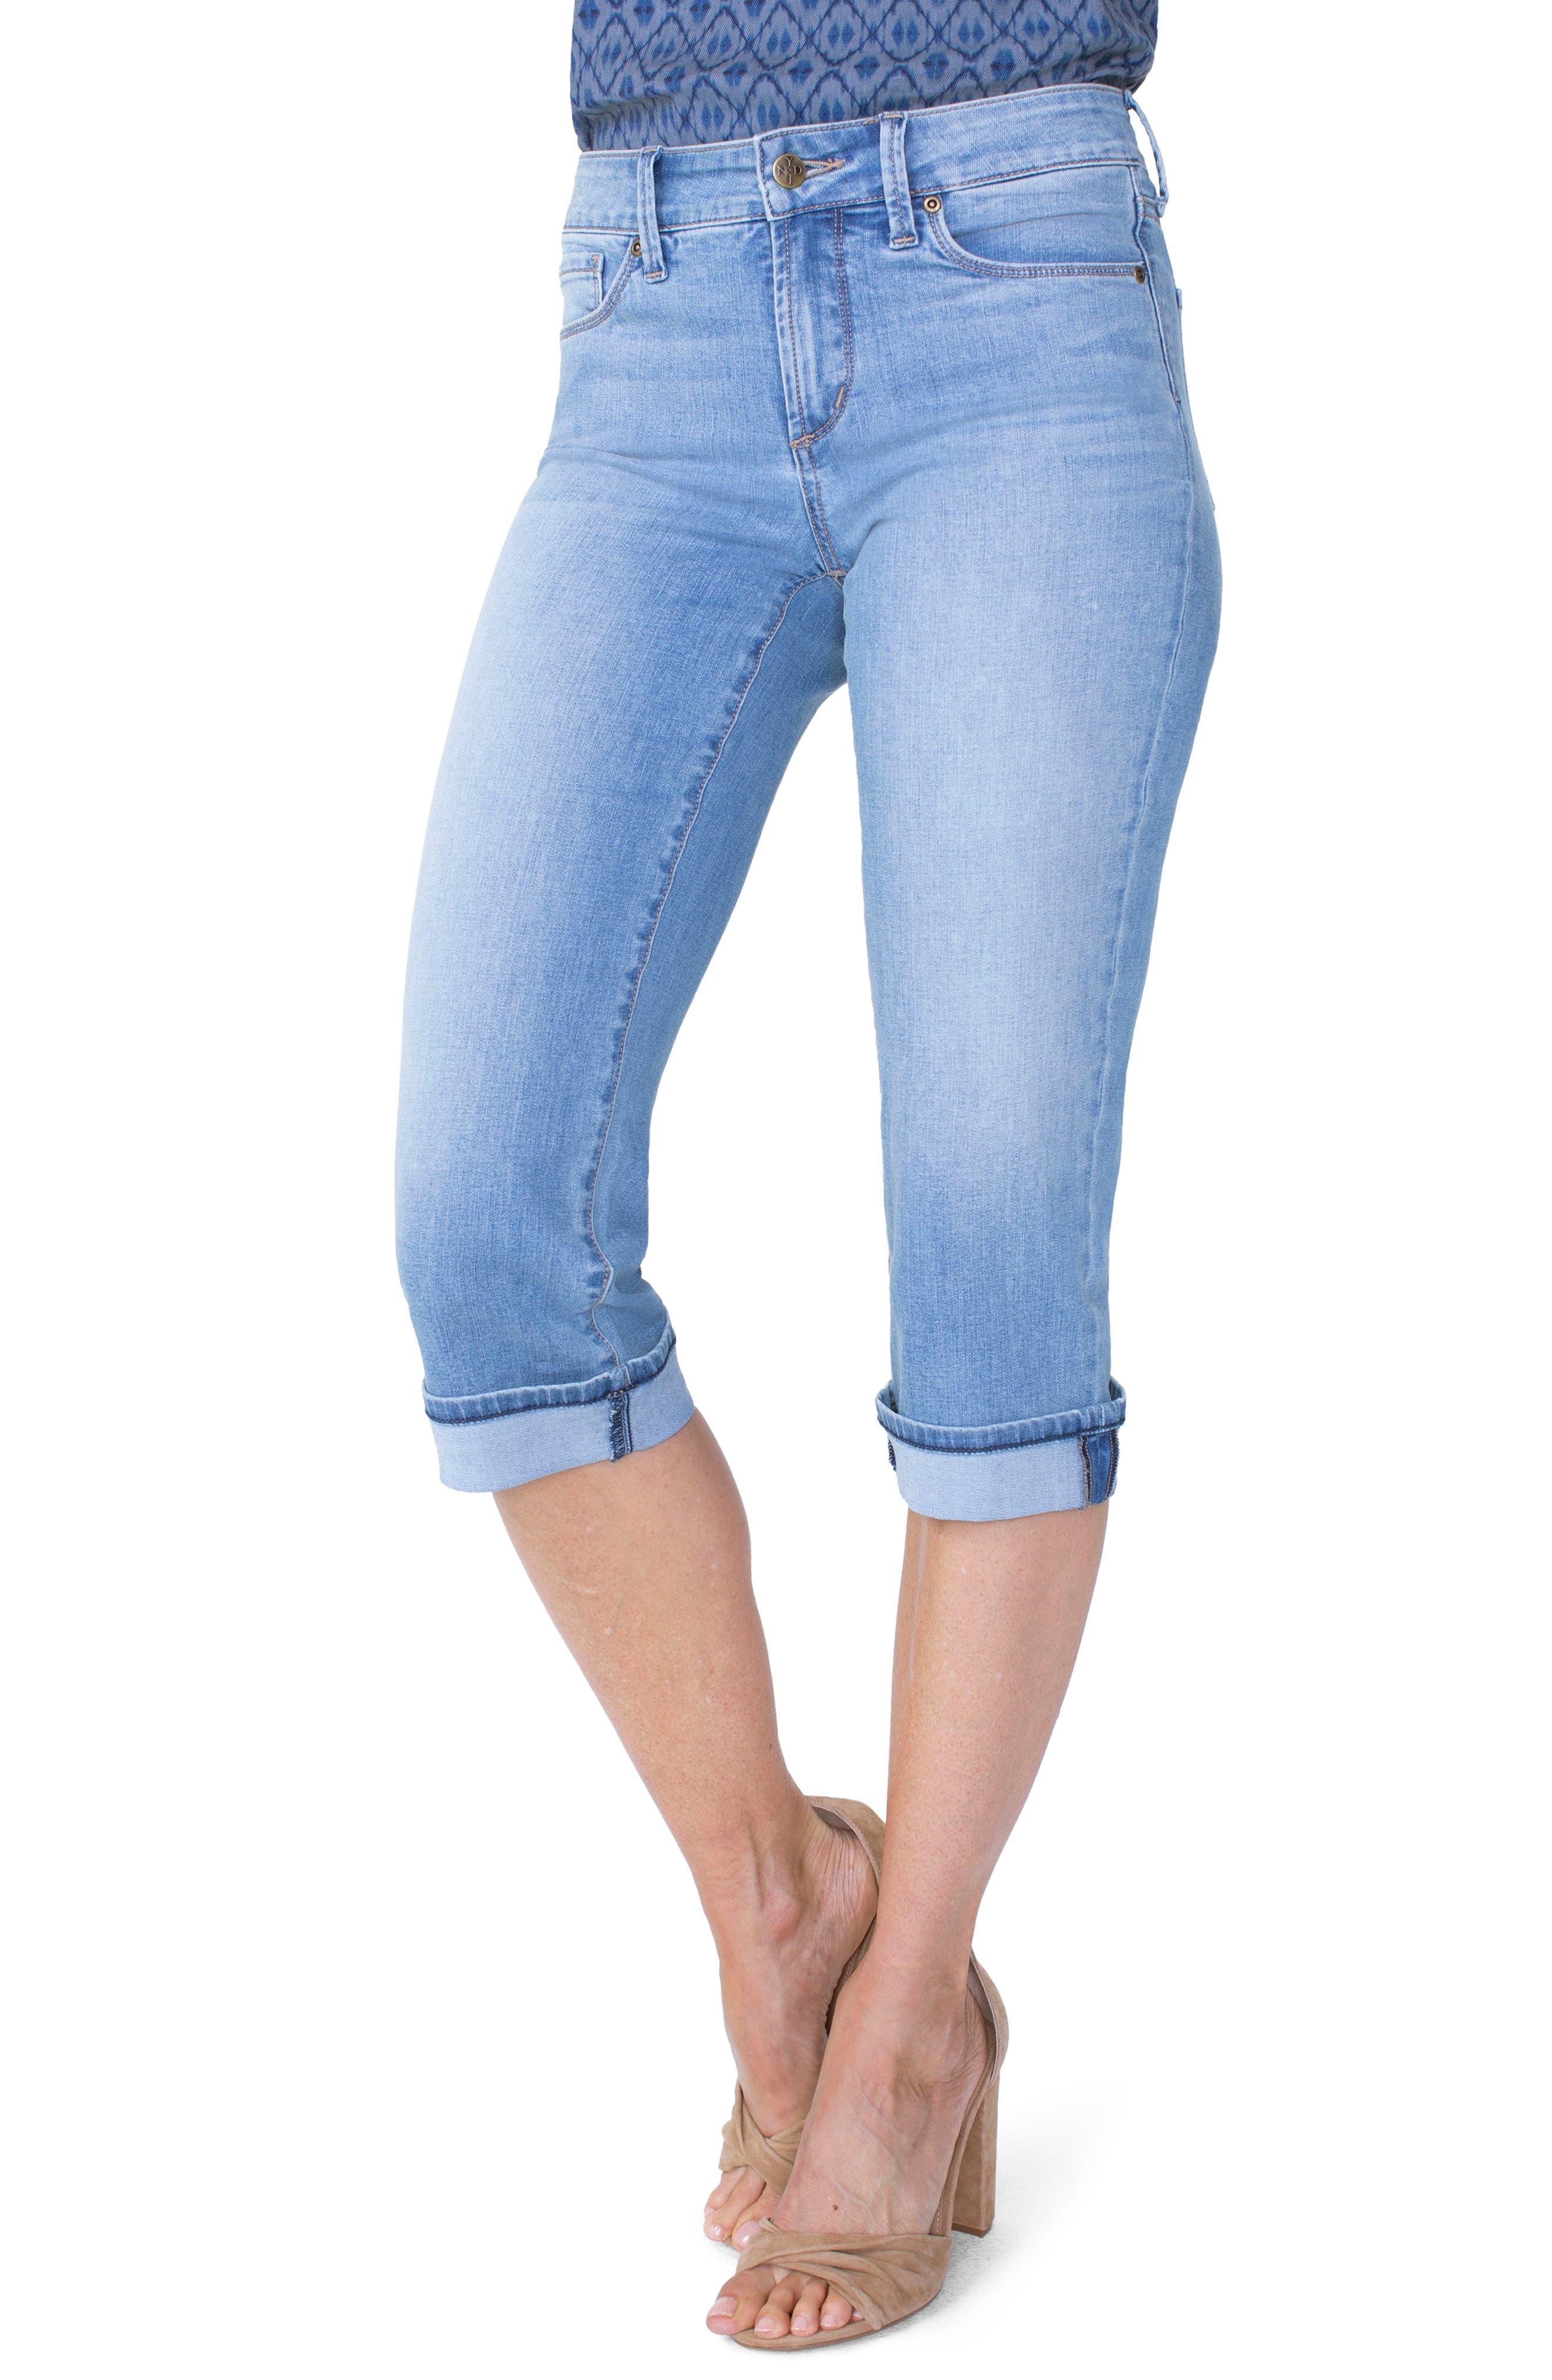 Marilyn High Waist Cuffed Stretch Crop Jeans,                             Main thumbnail 1, color,                             PAMPELONNE